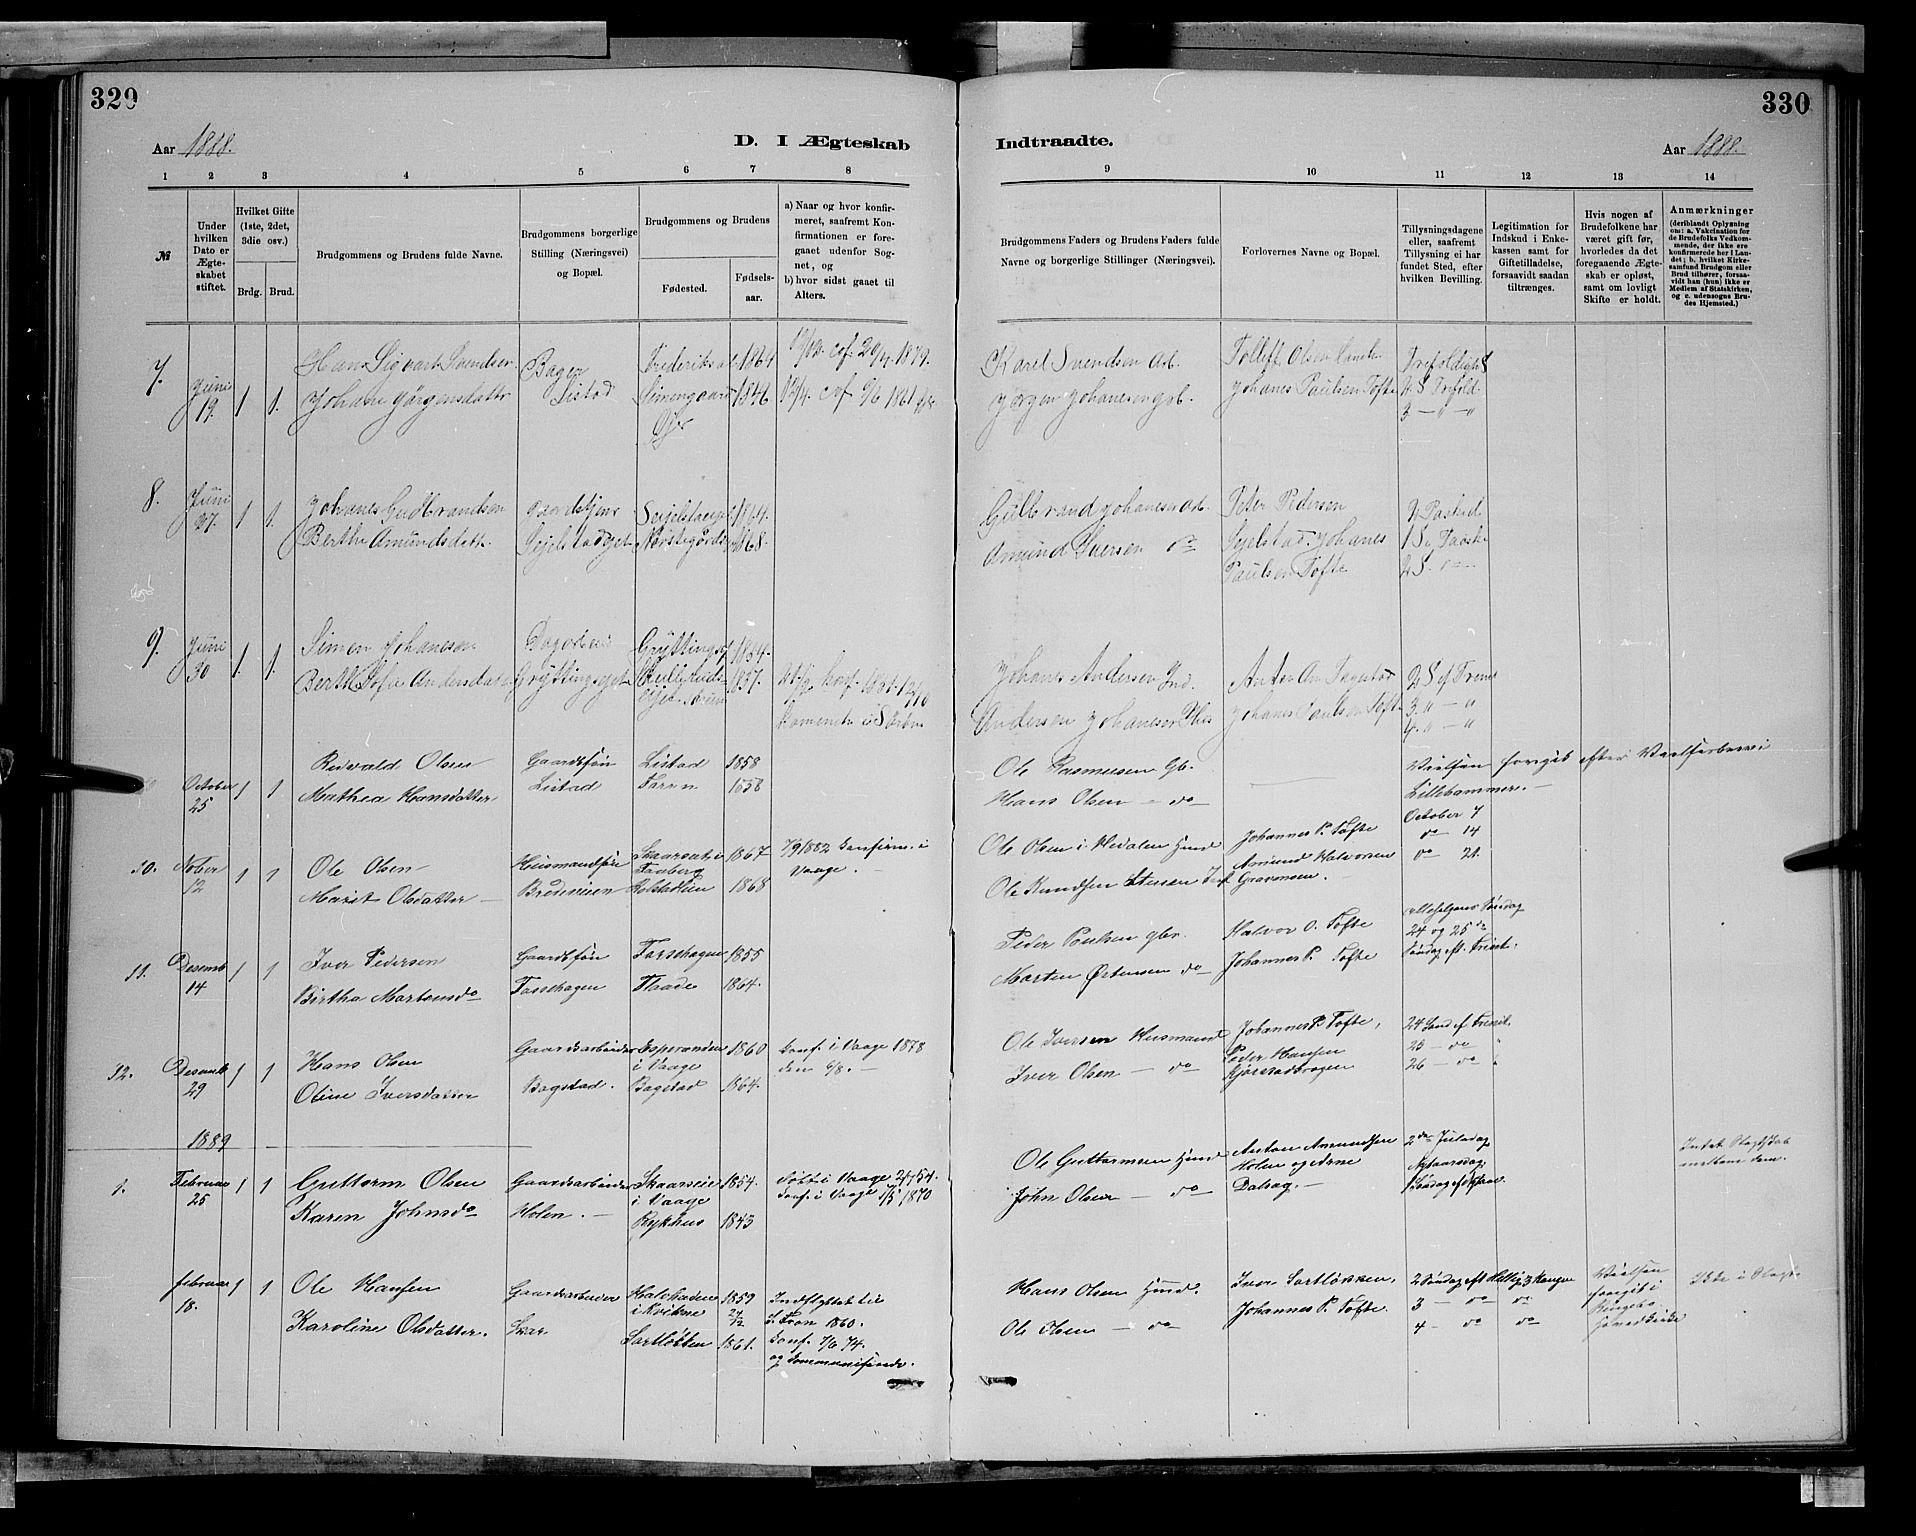 SAH, Sør-Fron prestekontor, H/Ha/Hab/L0003: Klokkerbok nr. 3, 1884-1896, s. 329-330